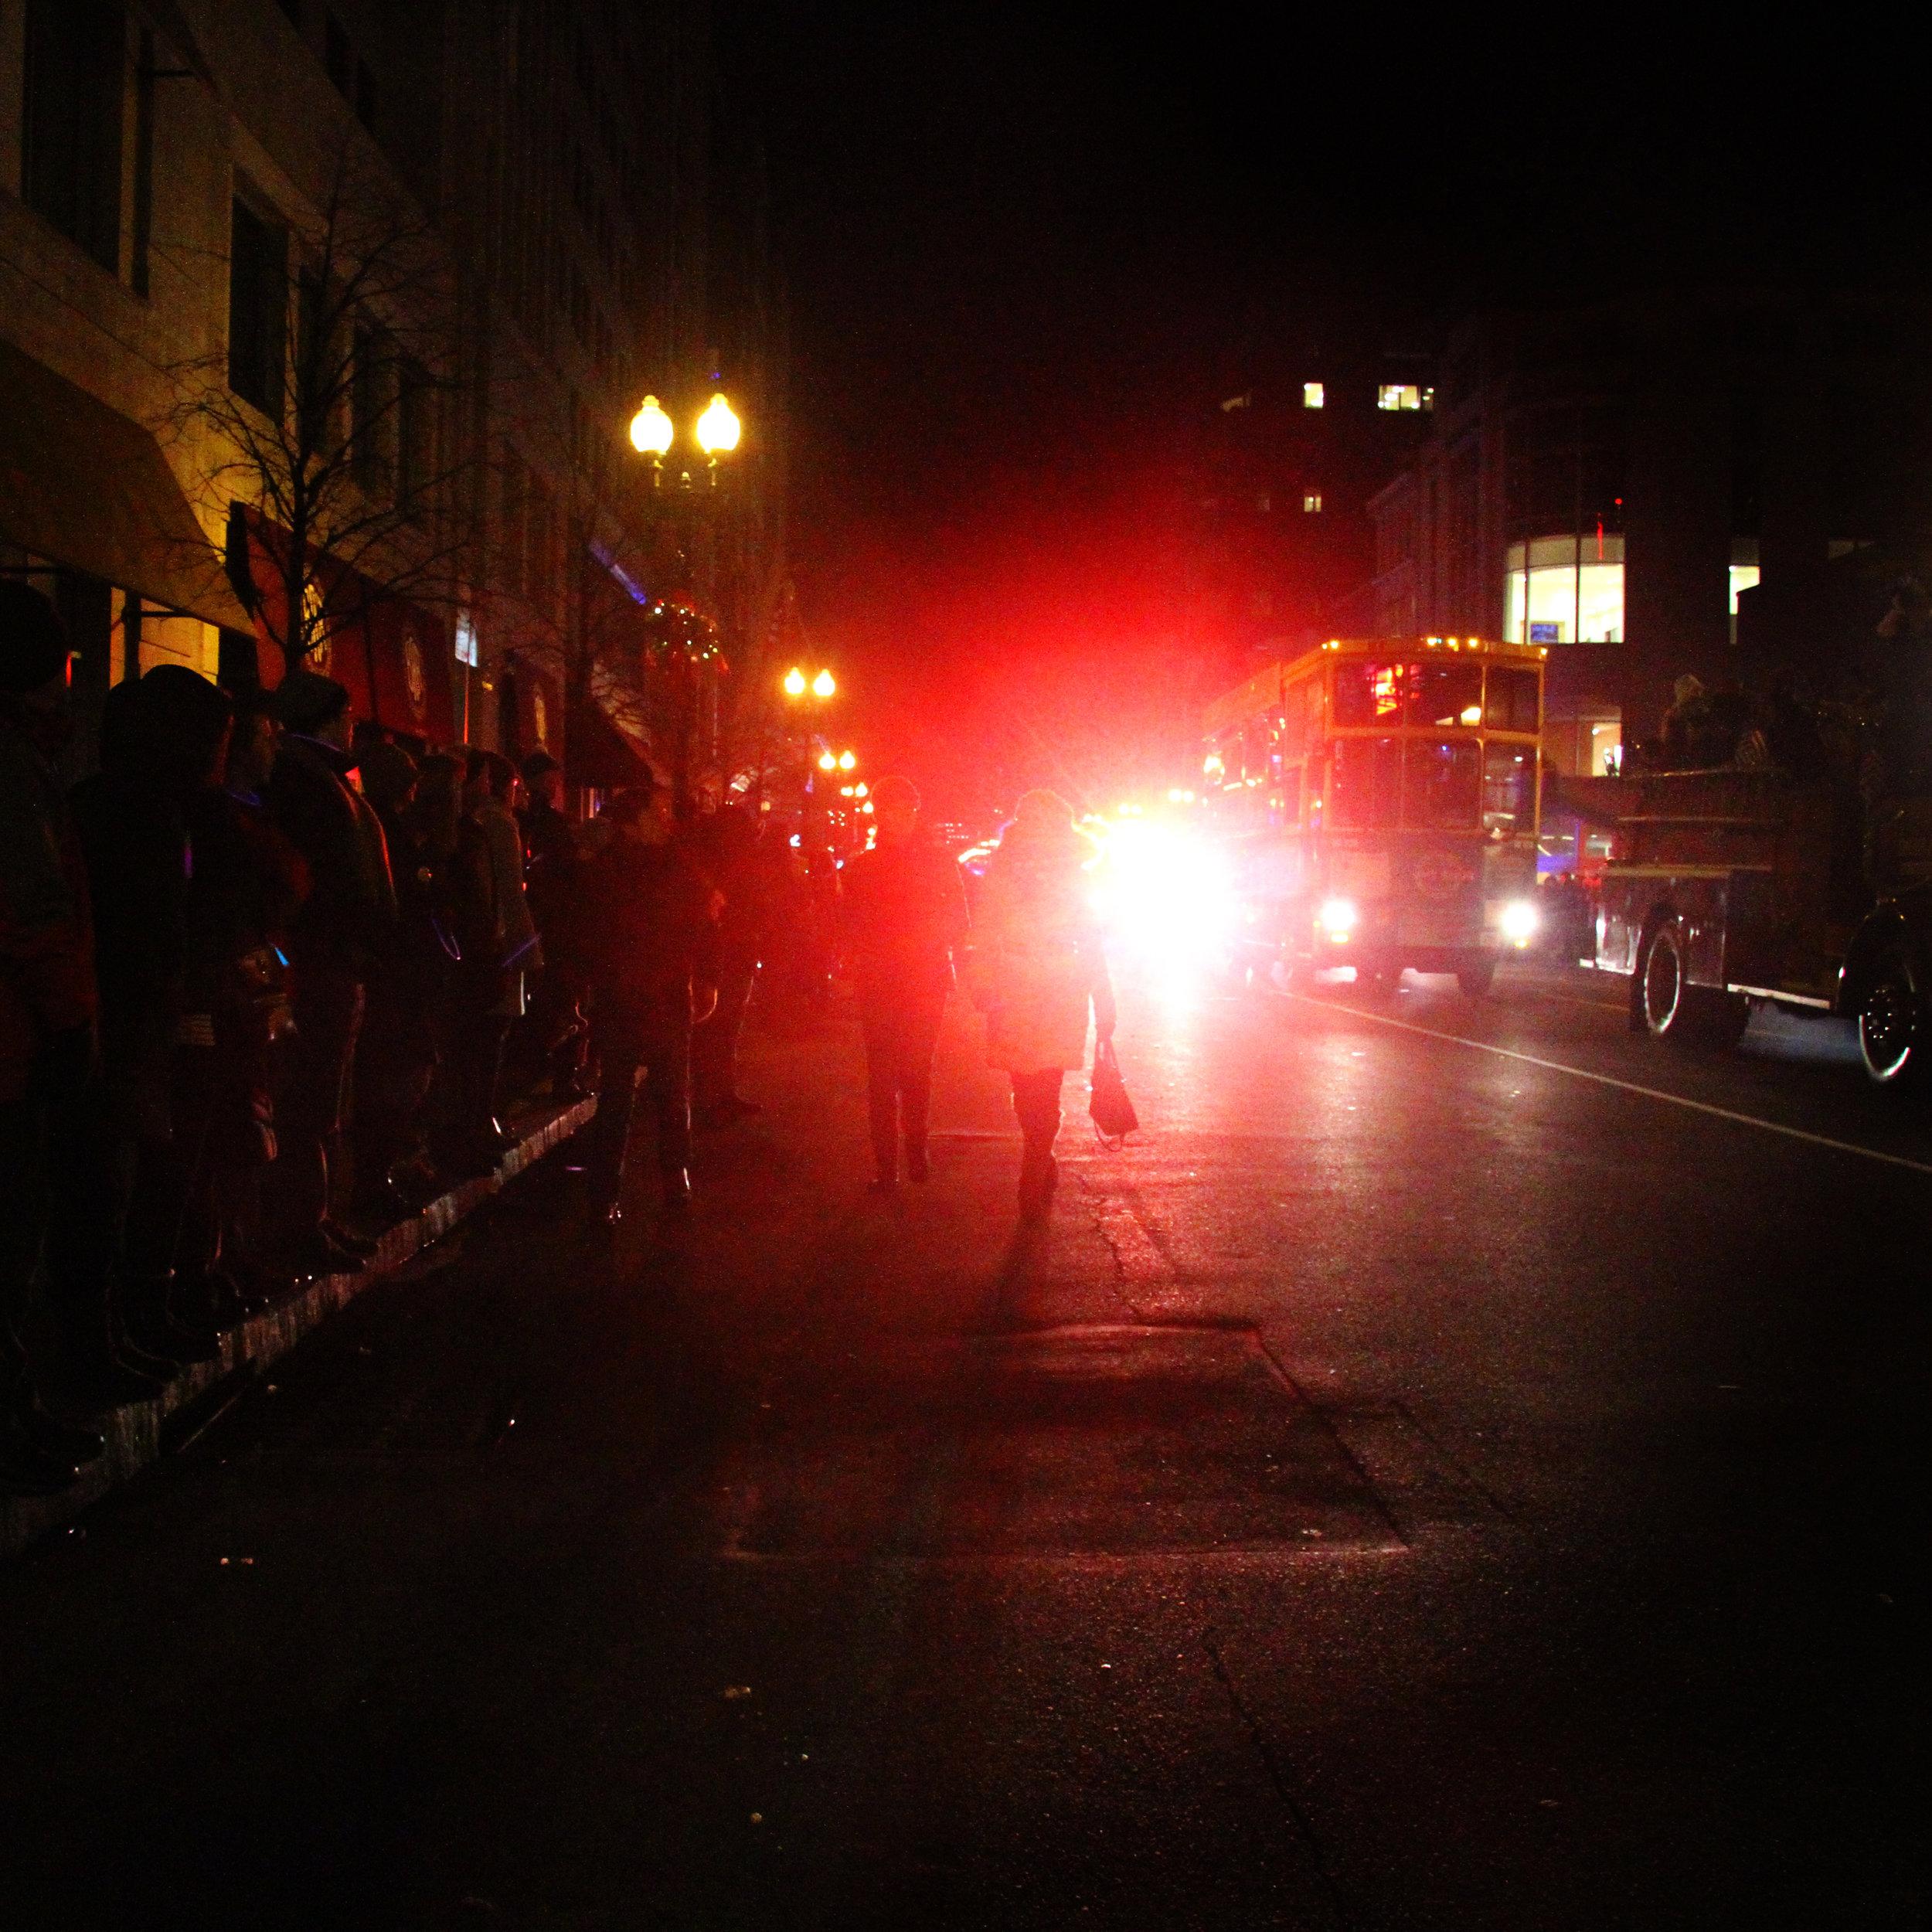 Boylston Street, December 31